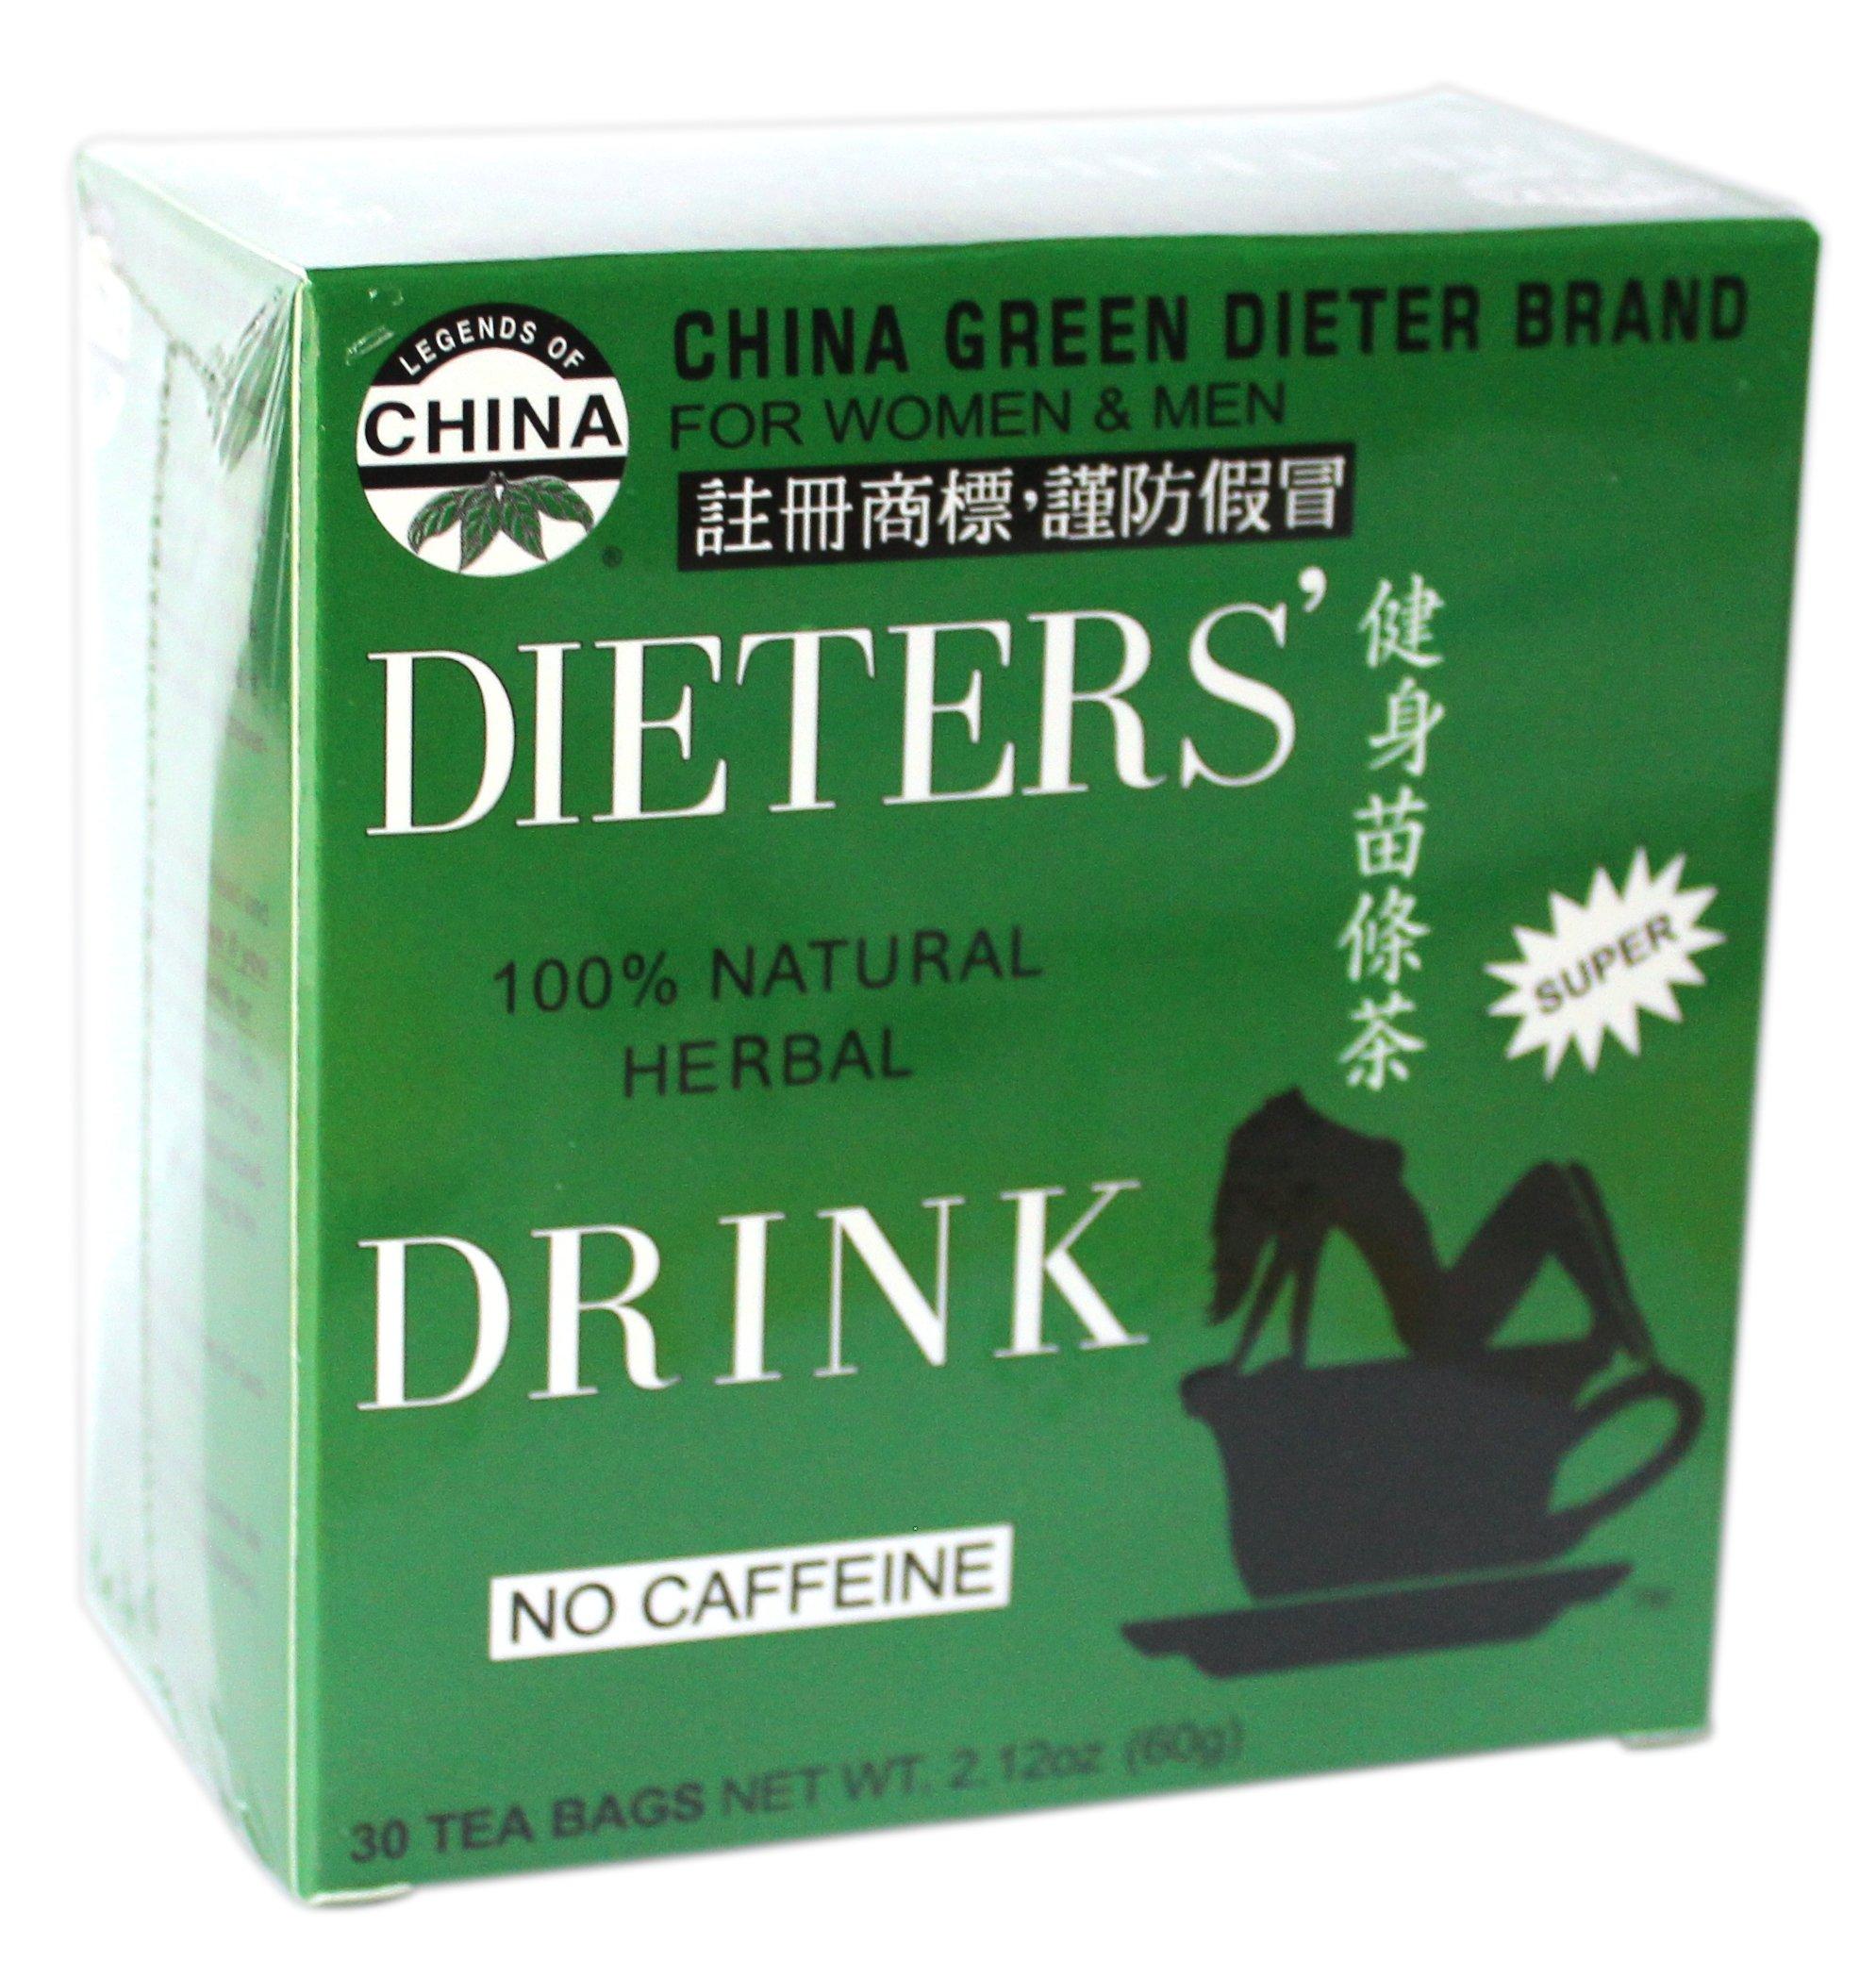 Uncle-Lees-China-Green-Dieters-Tea-Dieters-Drink-For-Weight-Loss-30-Tea-Bags-